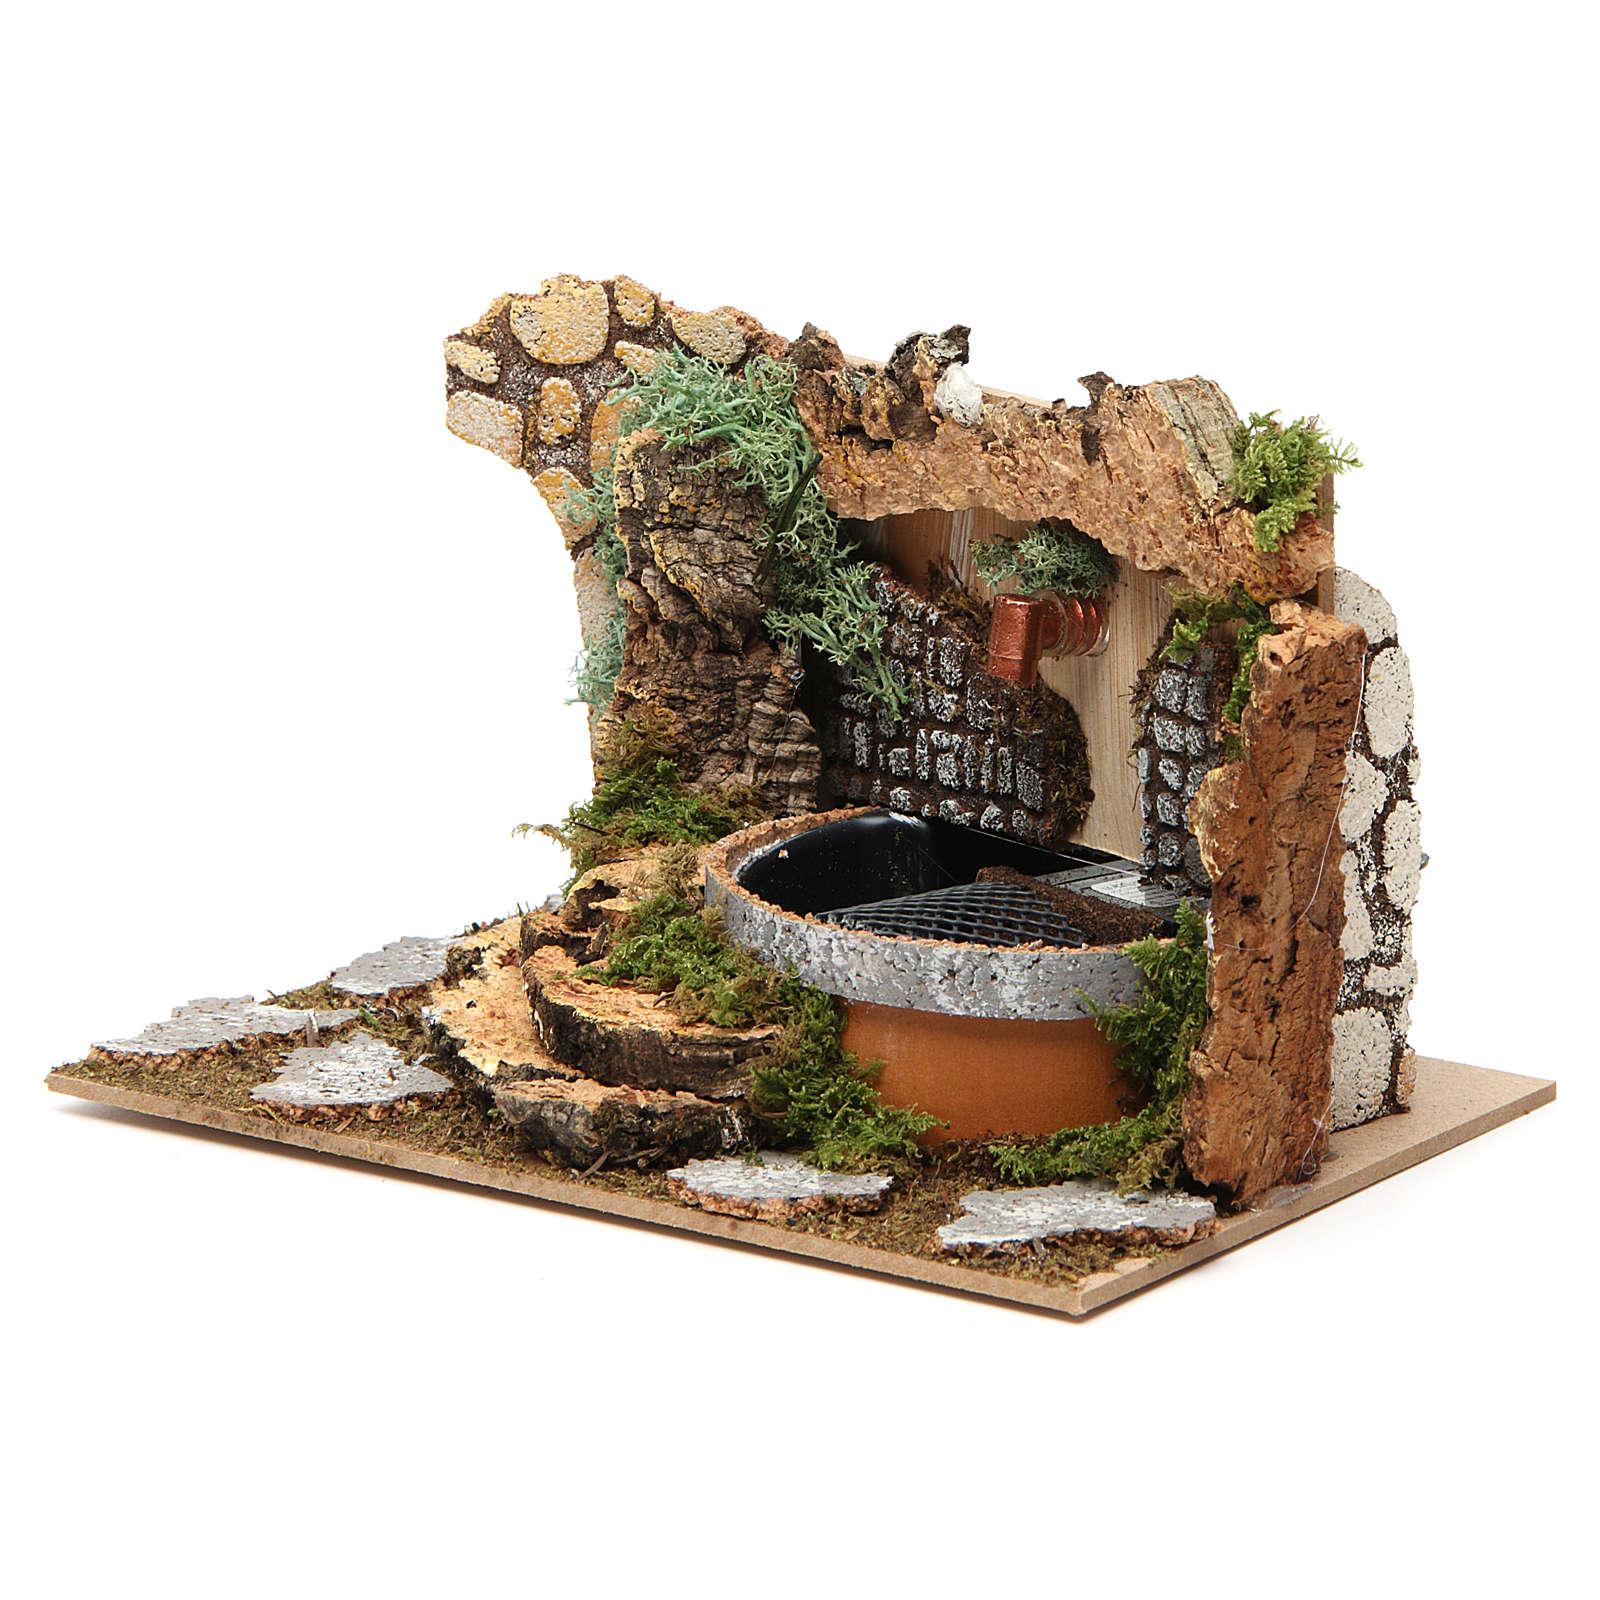 Fontana con rocce 10x20x15 cm 4